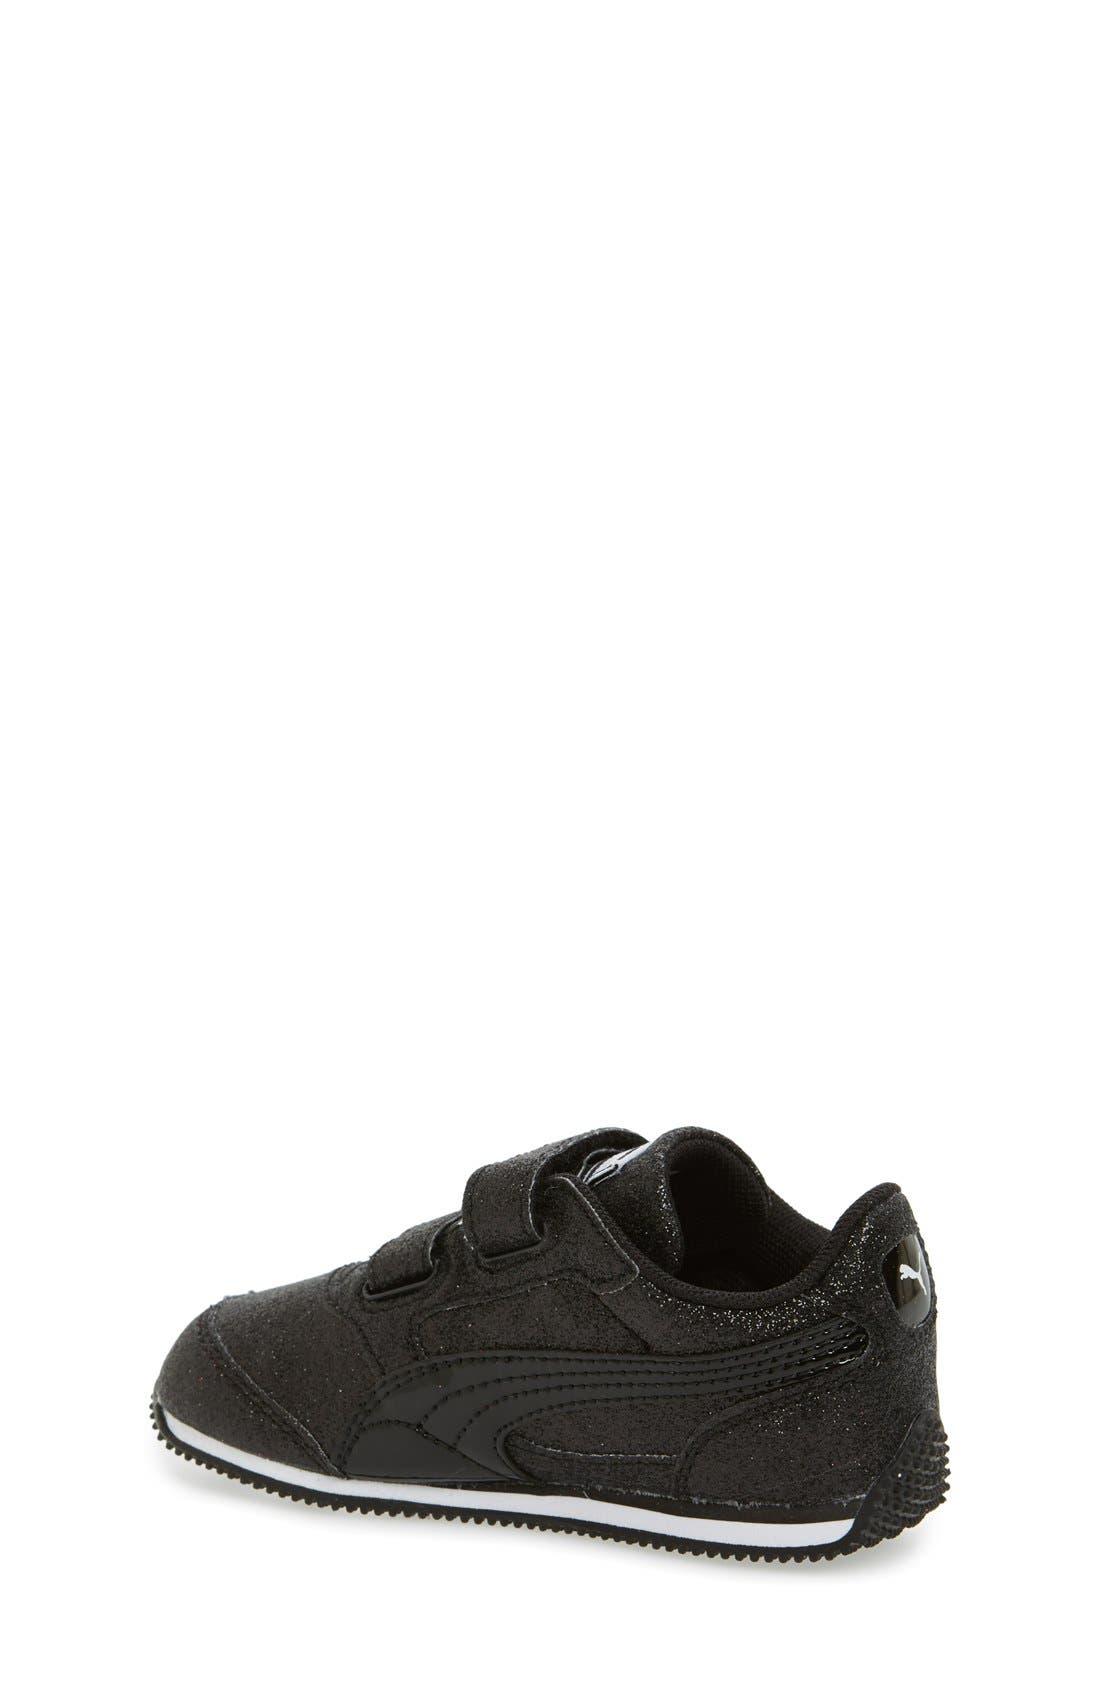 'Steeple Glitz' Sneaker,                             Alternate thumbnail 2, color,                             001